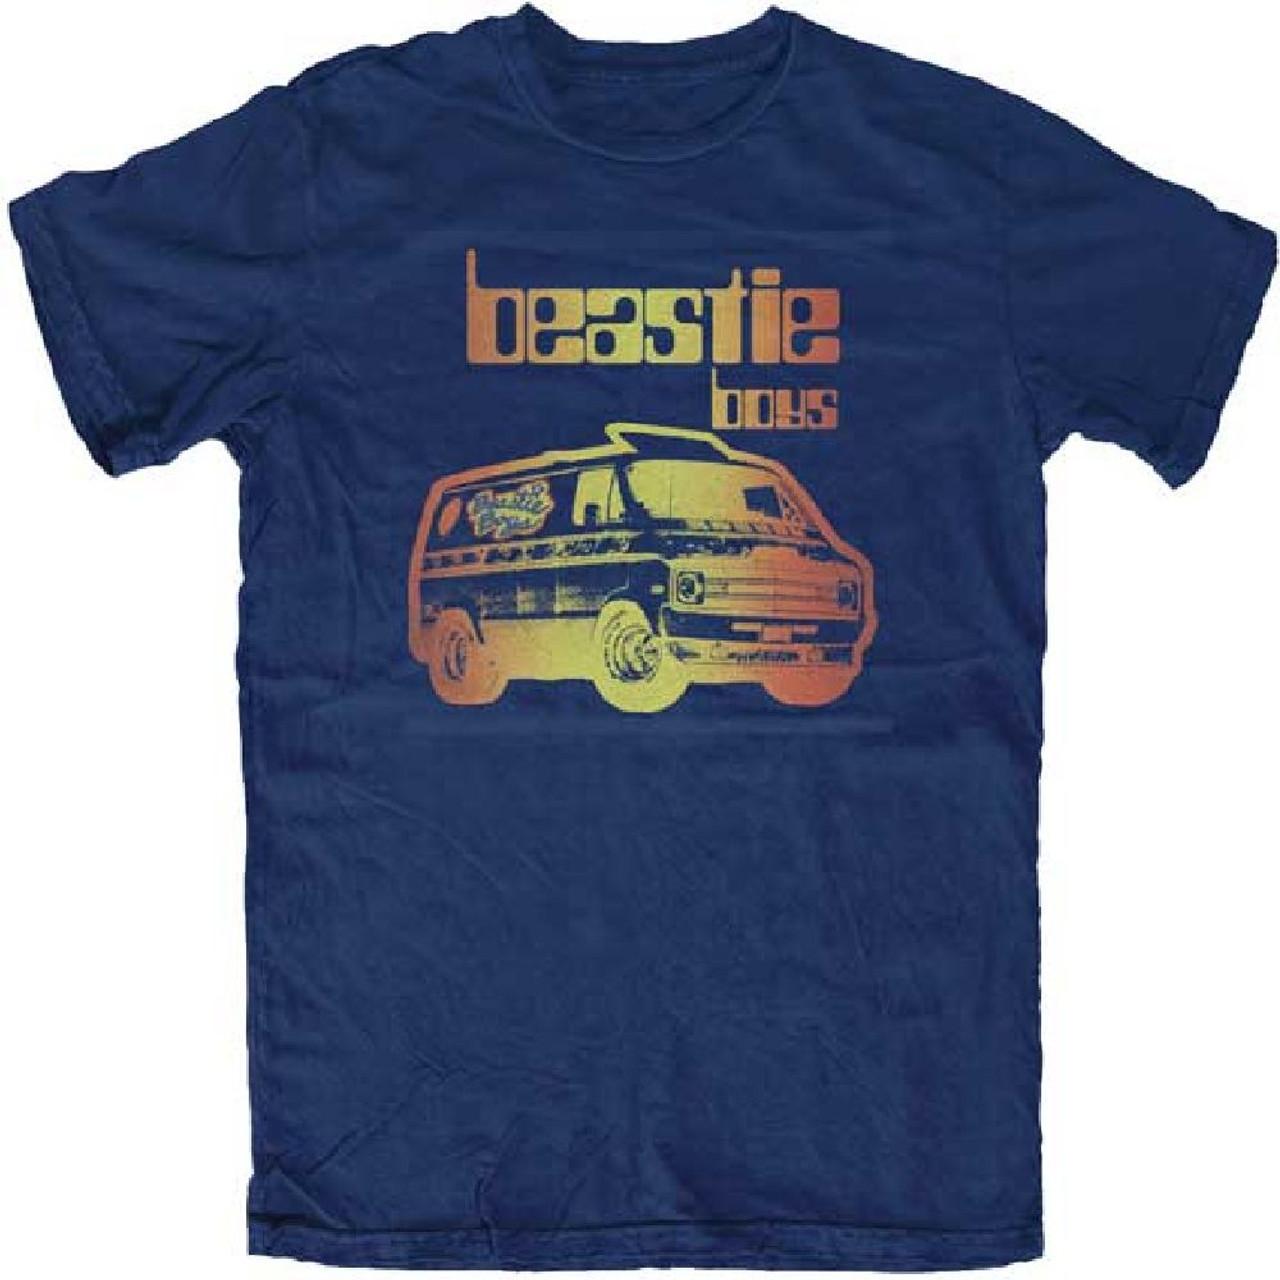 b94efc0452b1 Beastie Boys T-shirt - Beastie Boys Custom Van Logo | Men's Blue Shirt